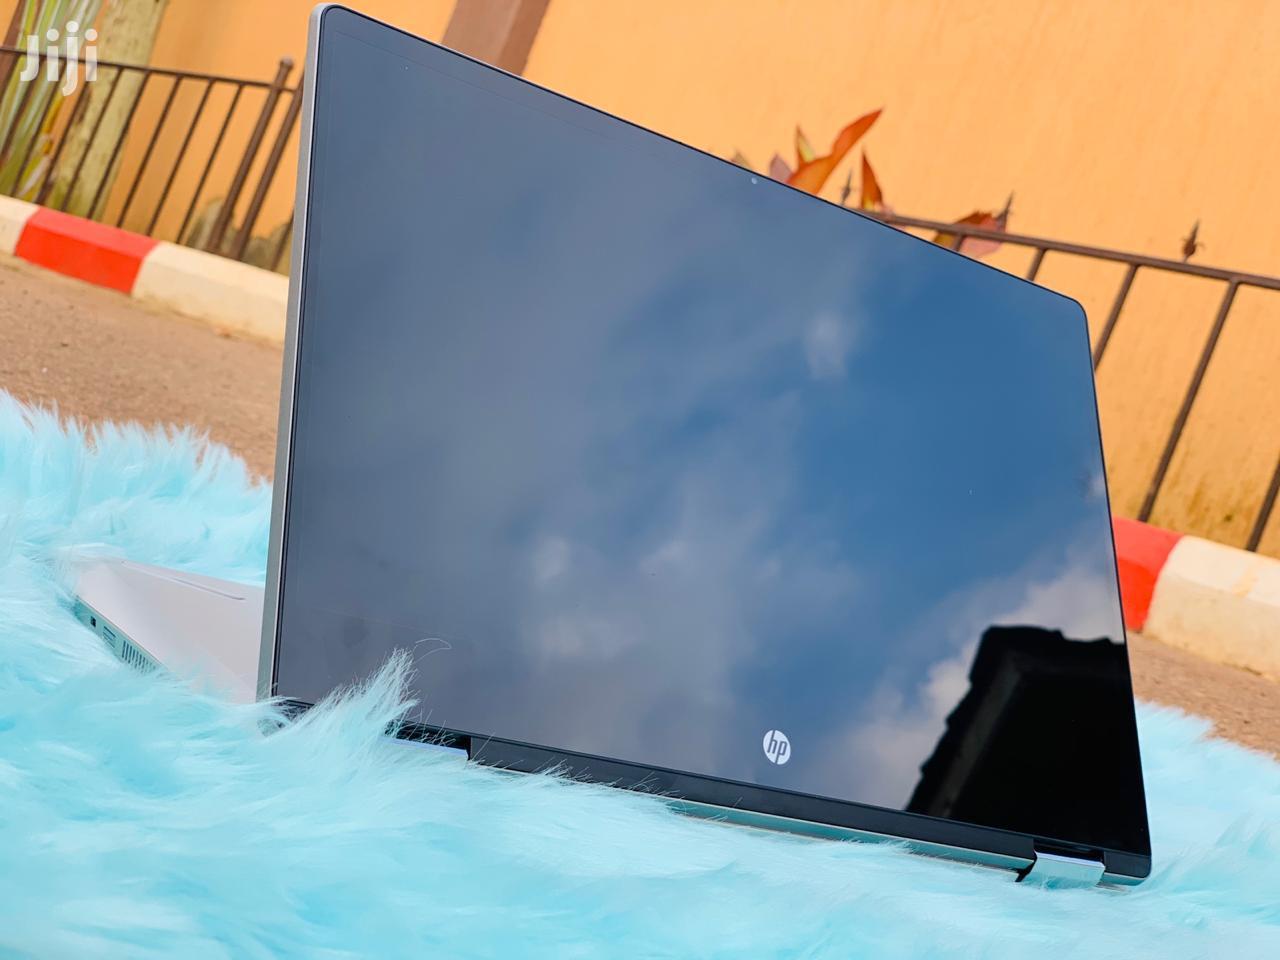 New Laptop HP Pavilion x360 14 16GB Intel Core i5 HDD 1T